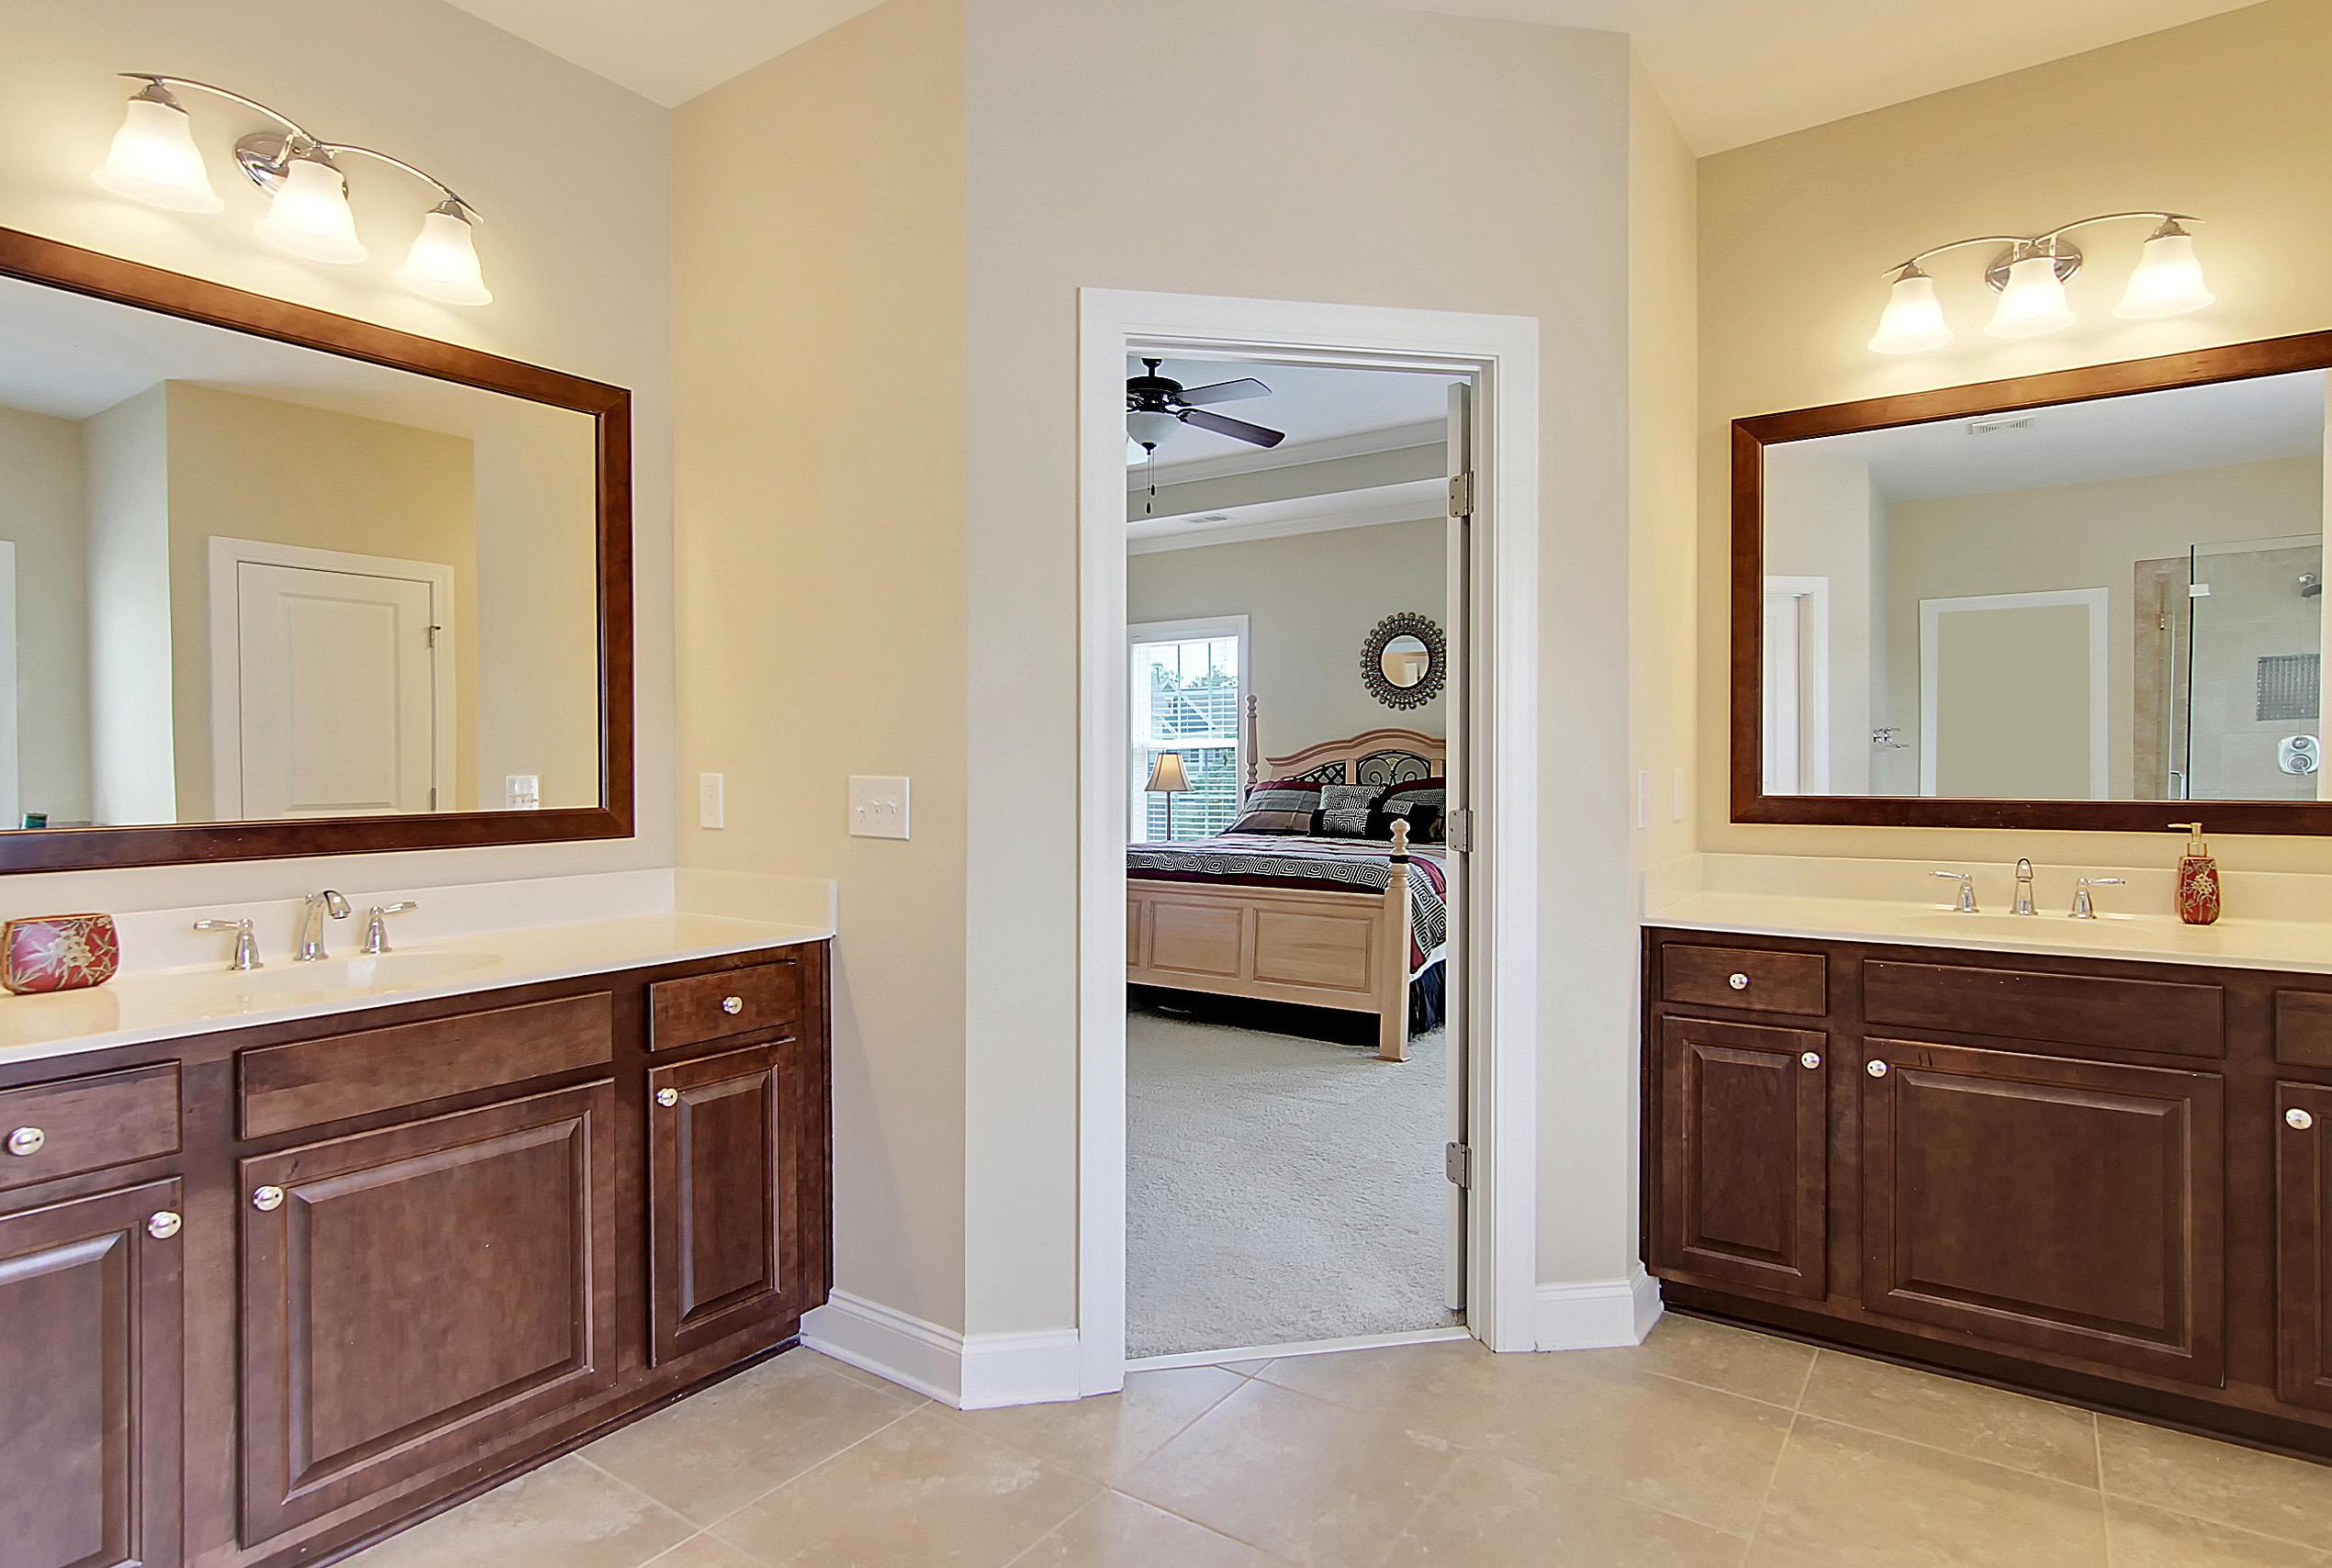 Dunes West Homes For Sale - 1332 Whisker Pole, Mount Pleasant, SC - 40